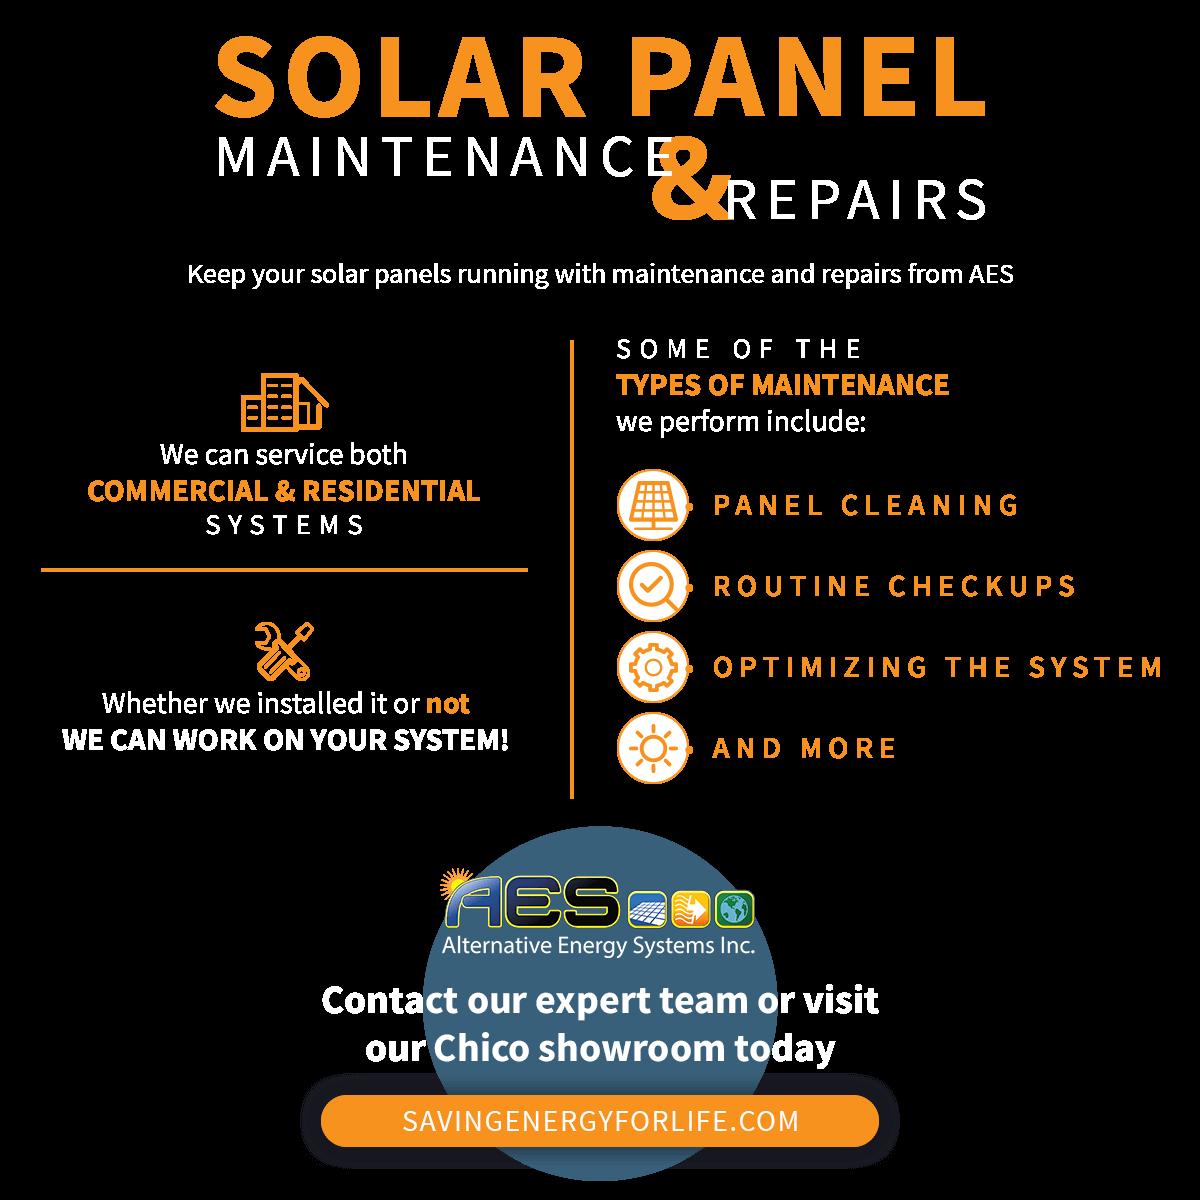 Solar Panel Maintenance And Repairs infographic